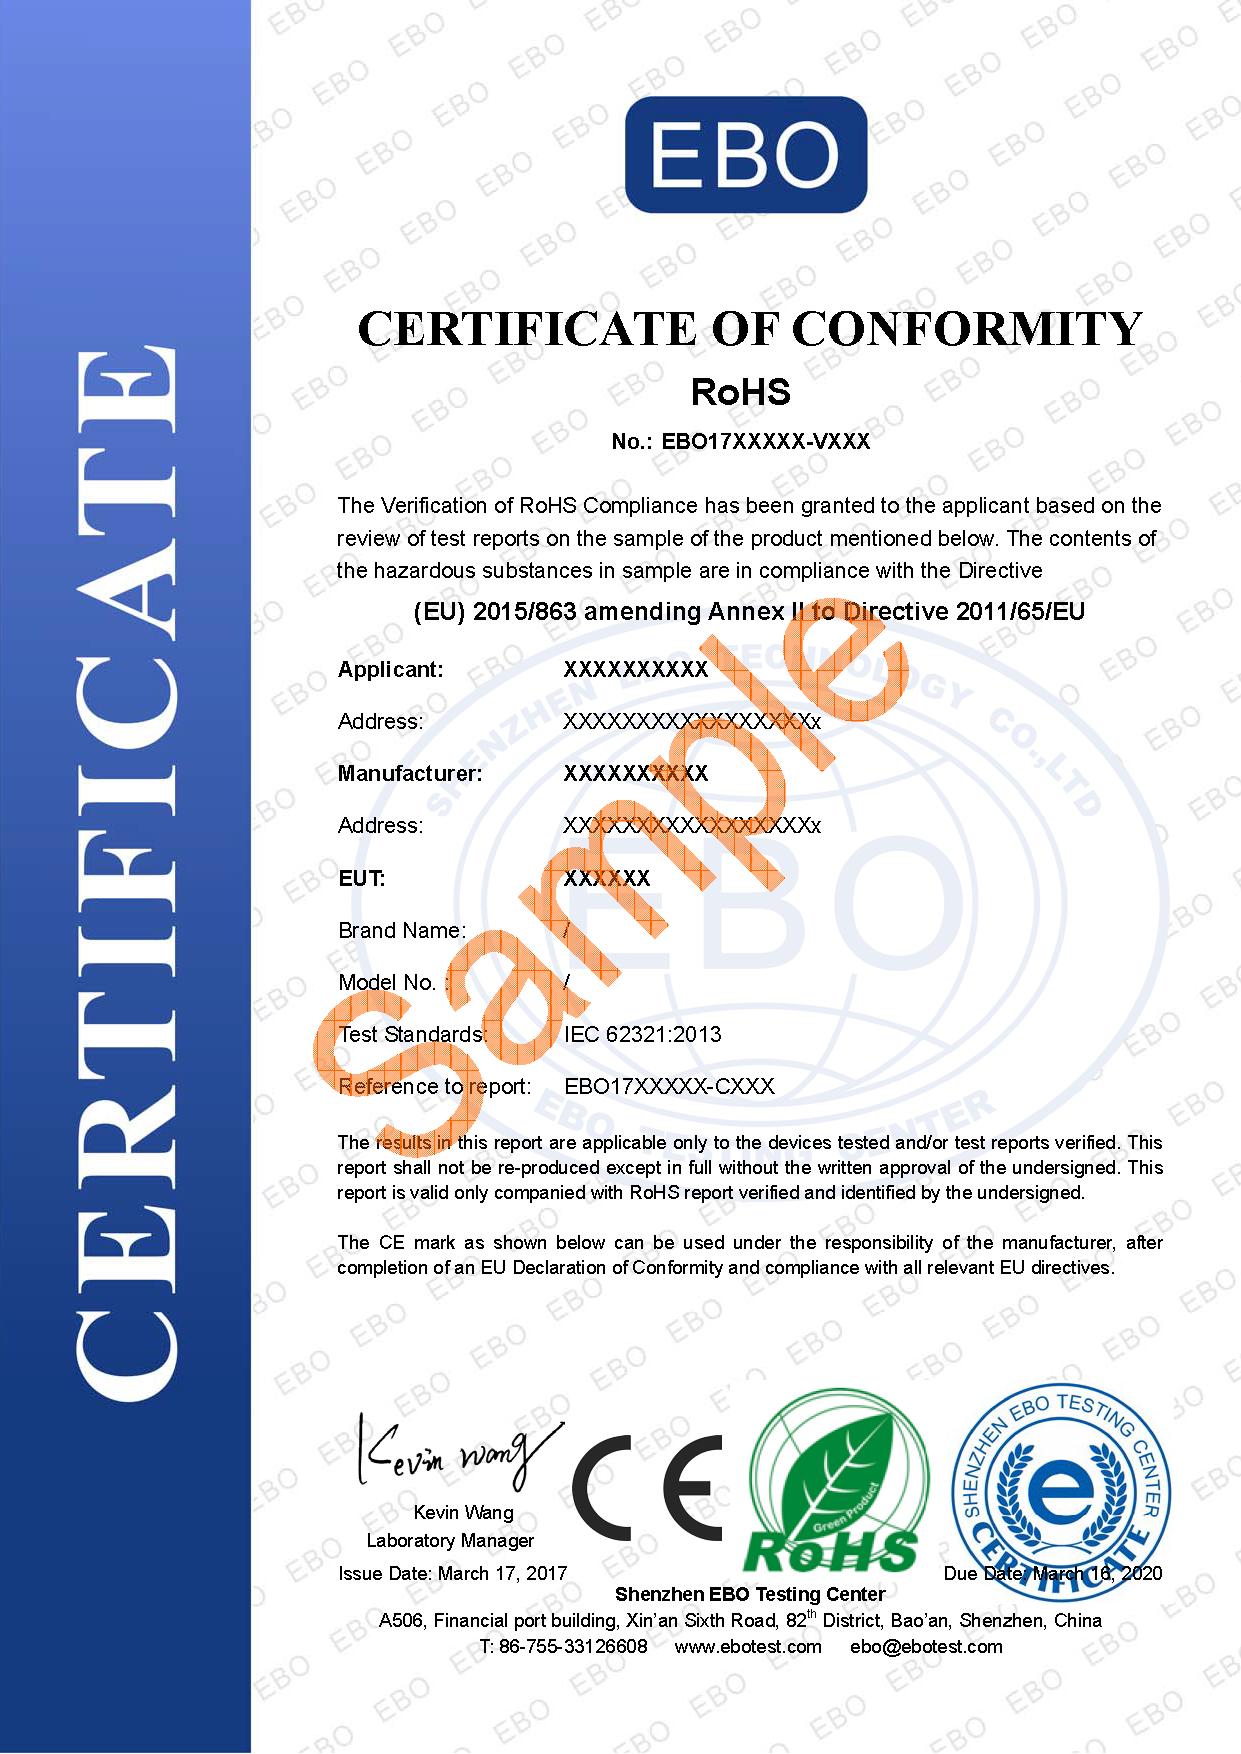 reach认证费用_欧盟RoHS证书_亿博RoHS认证机构